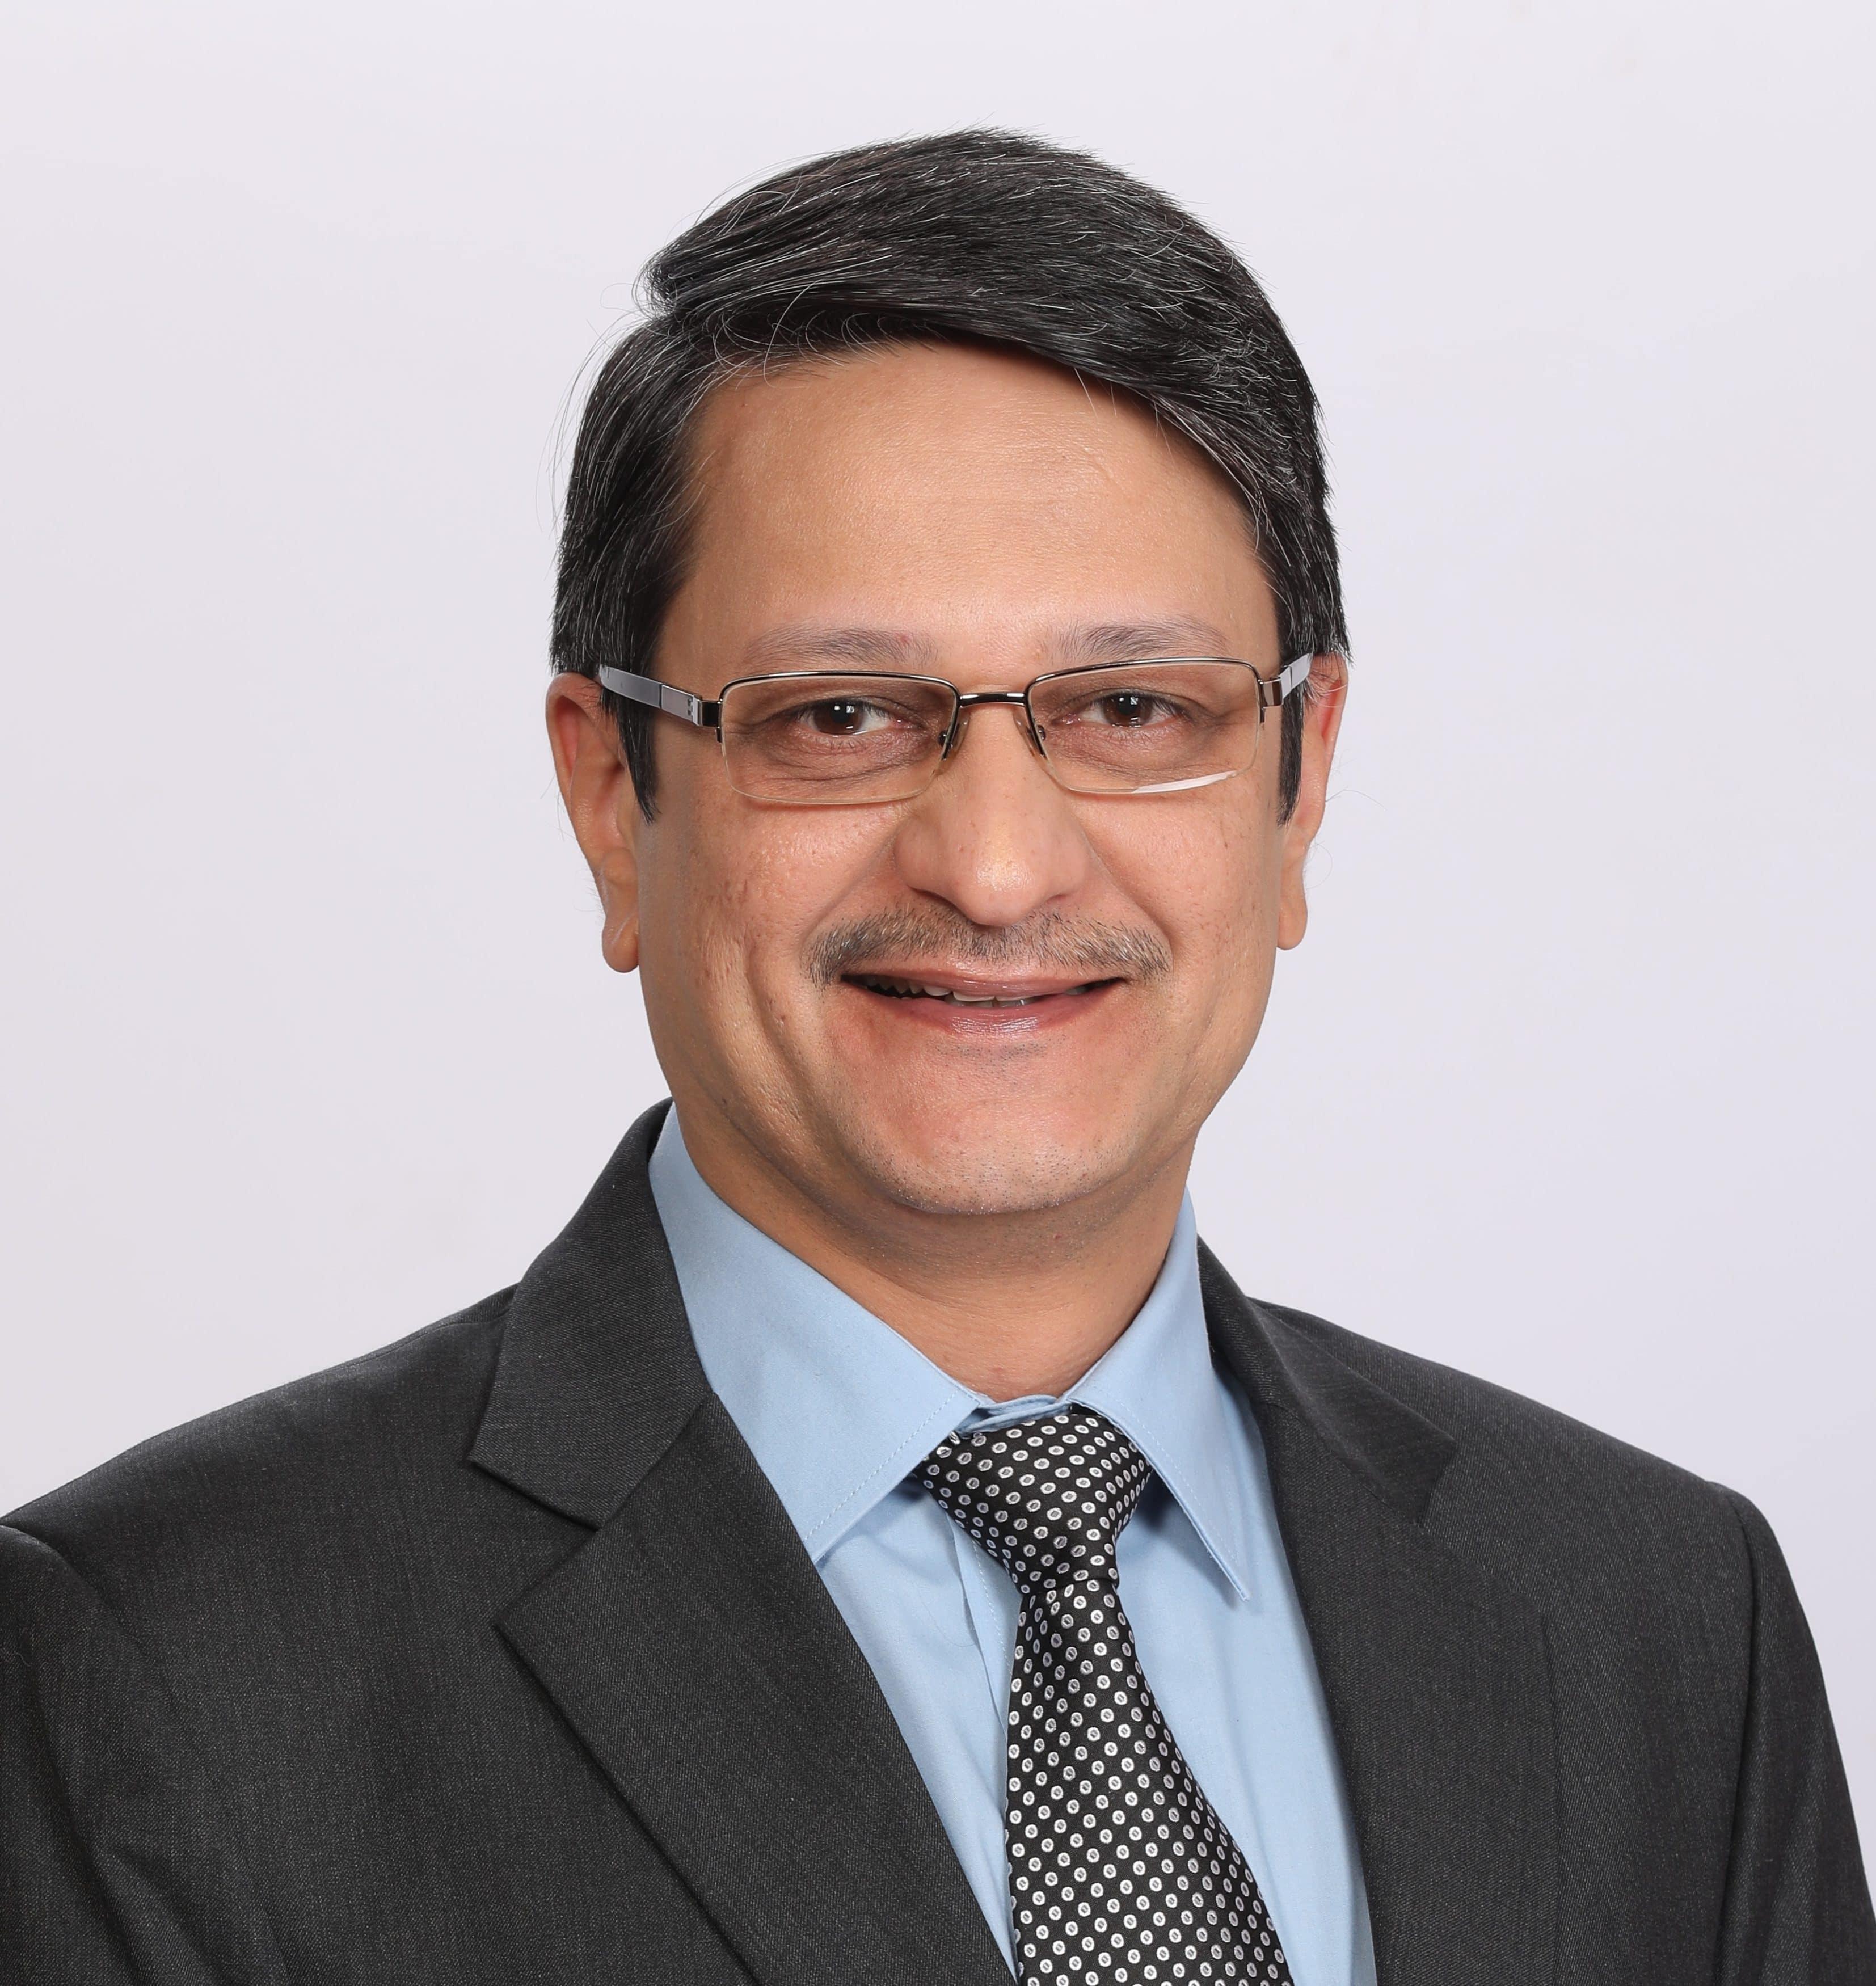 Viral-Oza-Chief-Marketing-Officer-Mahindra-Lifespaces-scaled.jpg